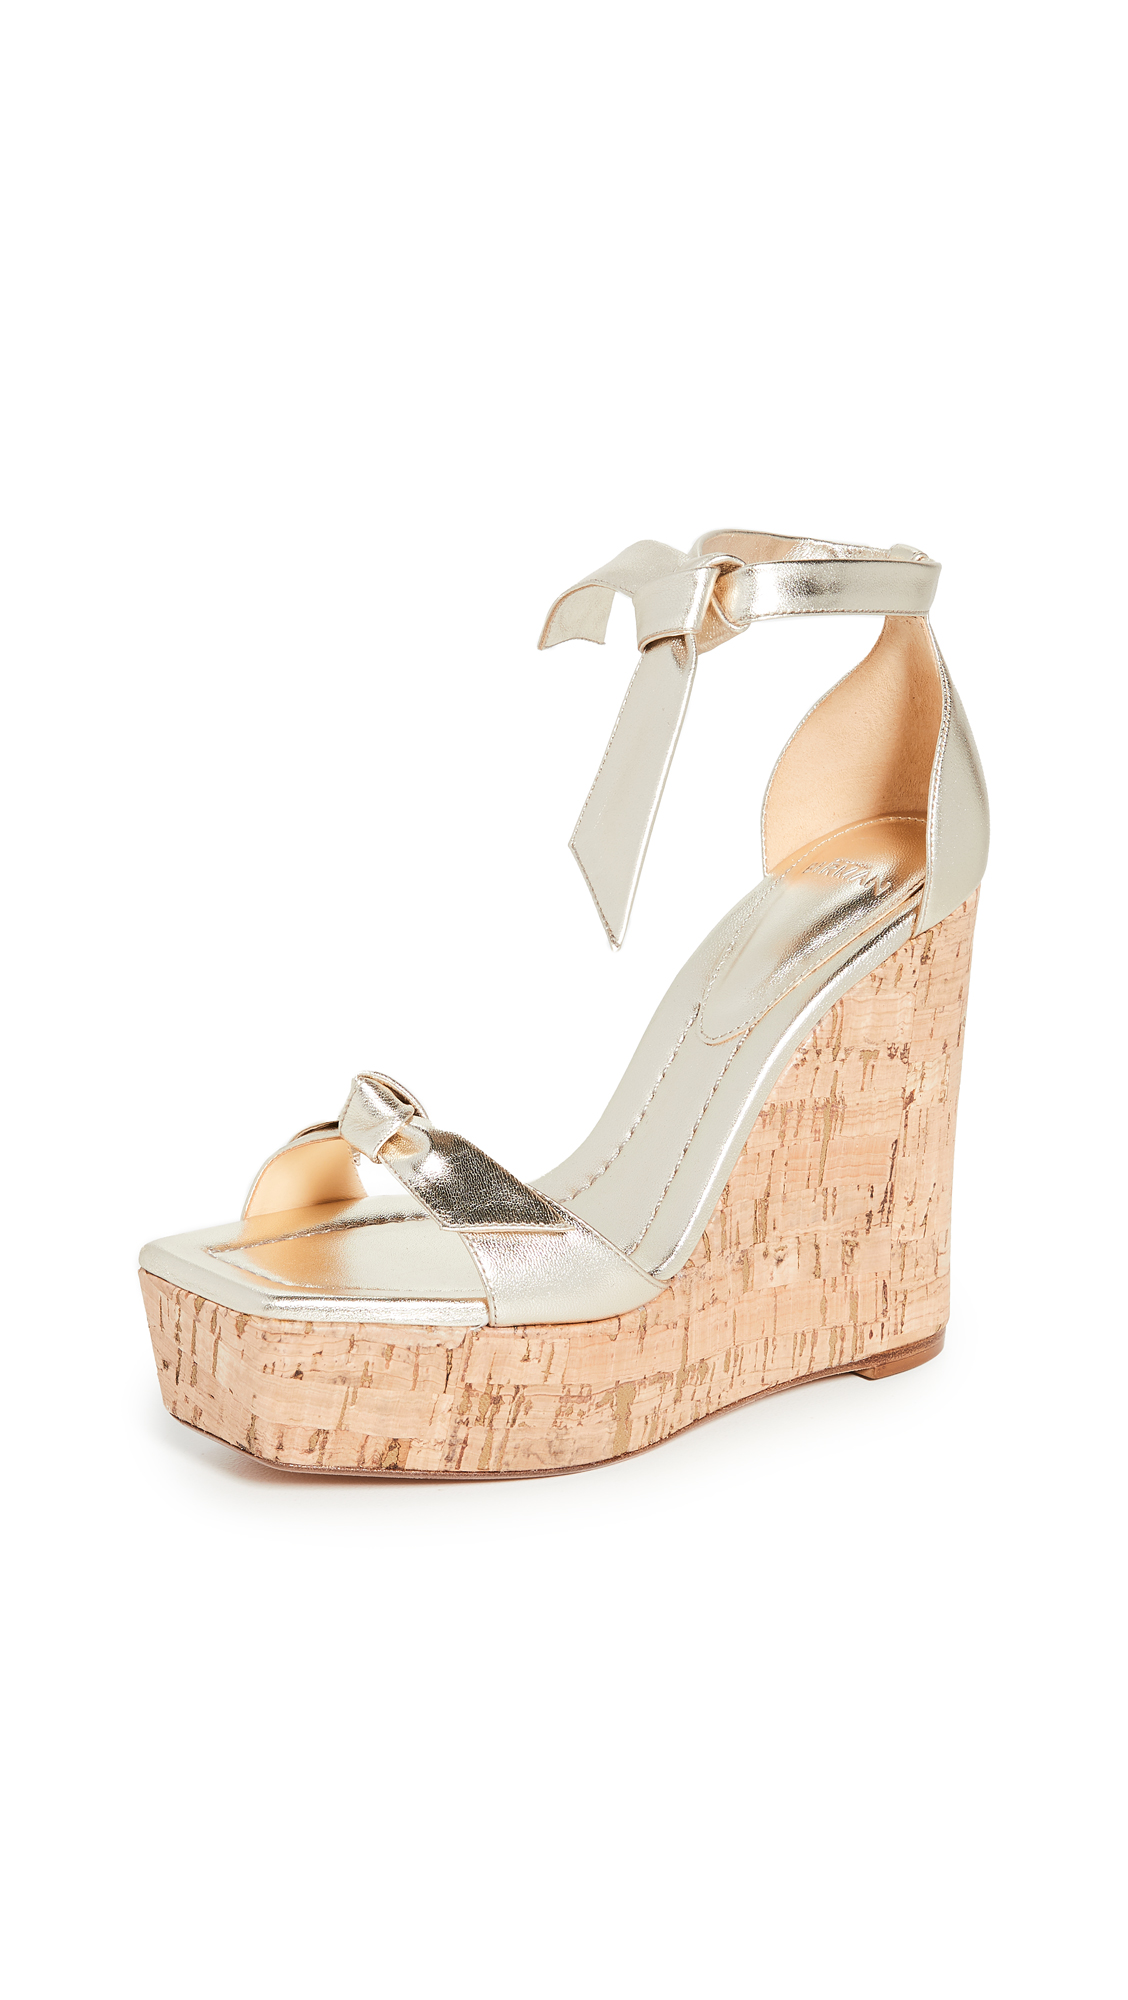 Alexandre Birman Clarita Square Wedge Sandals 130mm - 50% Off Sale